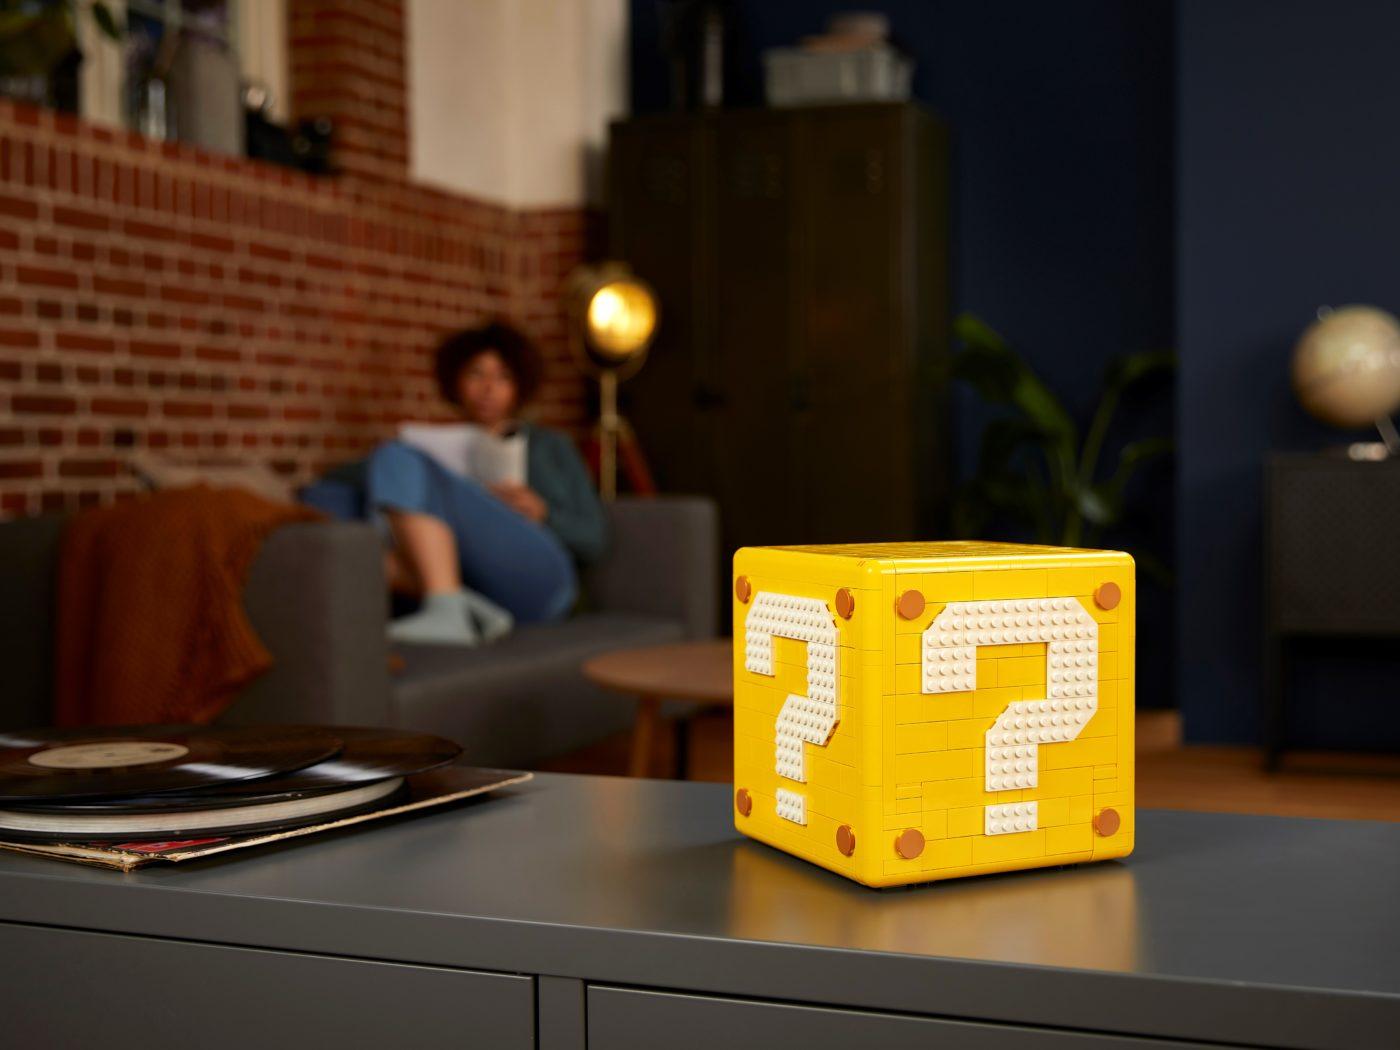 LEGO 71395 Super Mario 64 Question Mark Block Block Mode